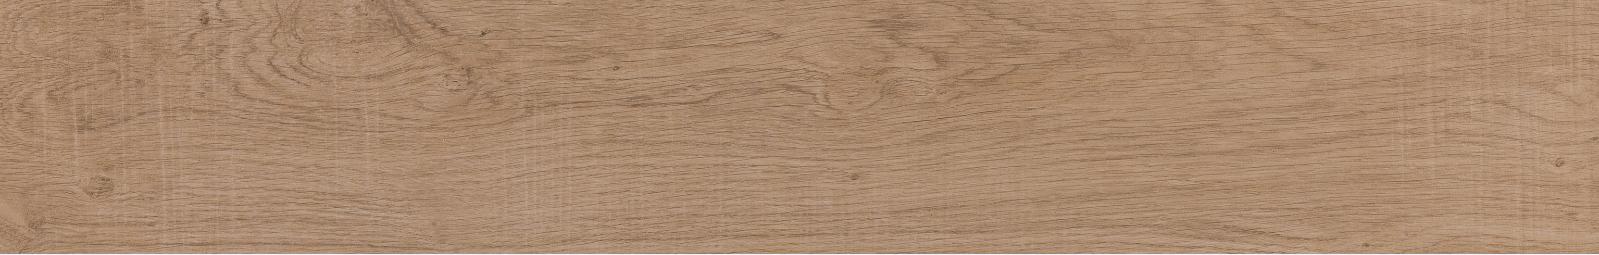 Напольная плитка Porcelanosa Oxford +14178 Natural напольная плитка ecoceramic capuccino natural 45x45